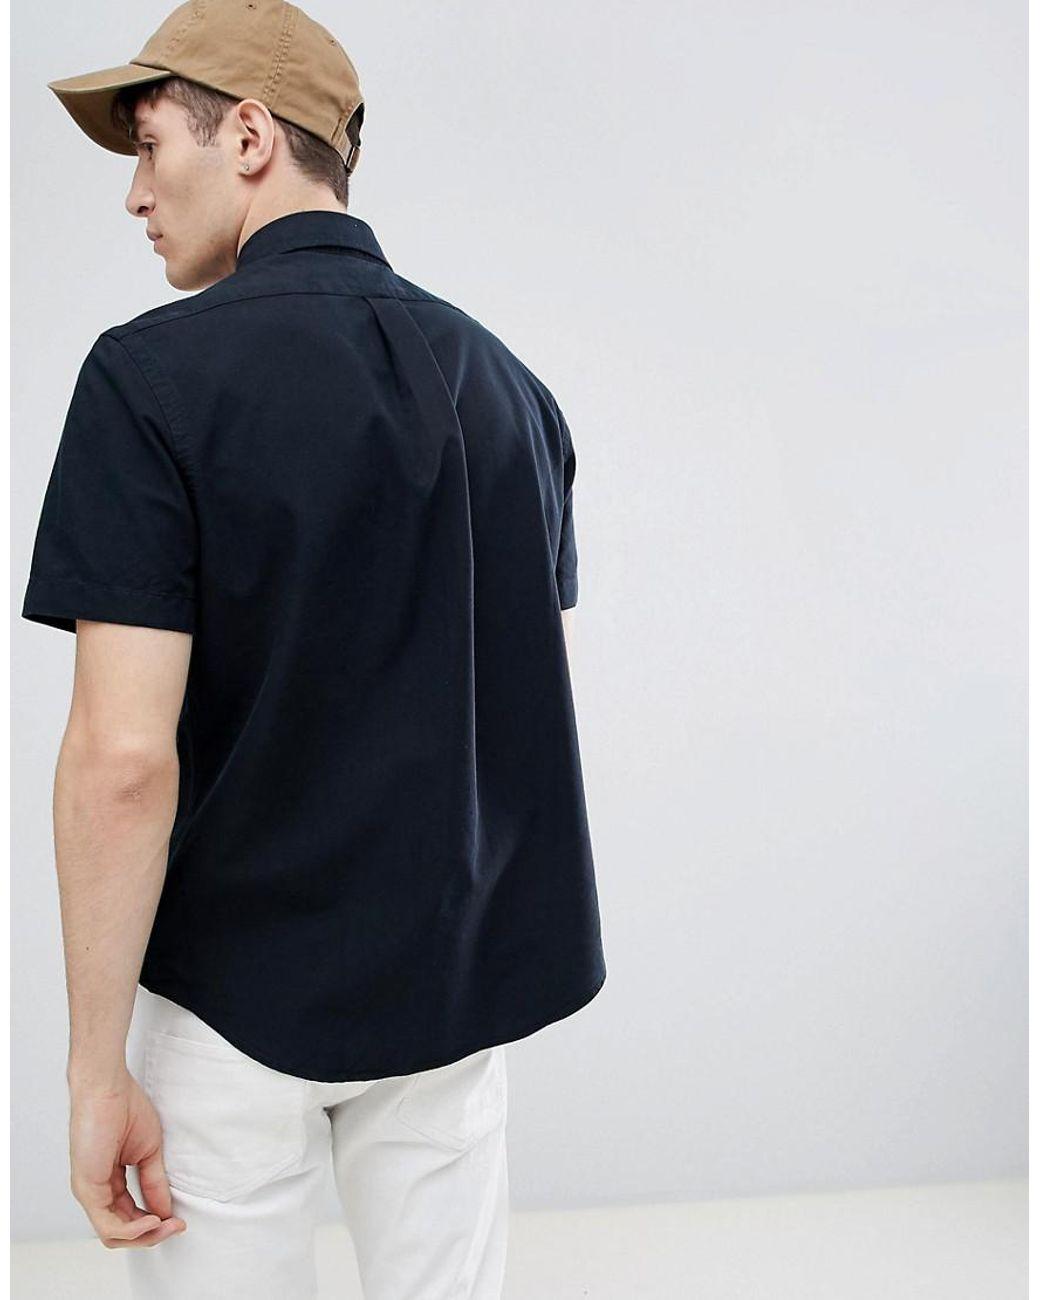 7c5008dd1 Polo Ralph Lauren Player Logo Short Sleeve Oxford Shirt Button-down Custom  Regular Fit In Black in Black for Men - Lyst